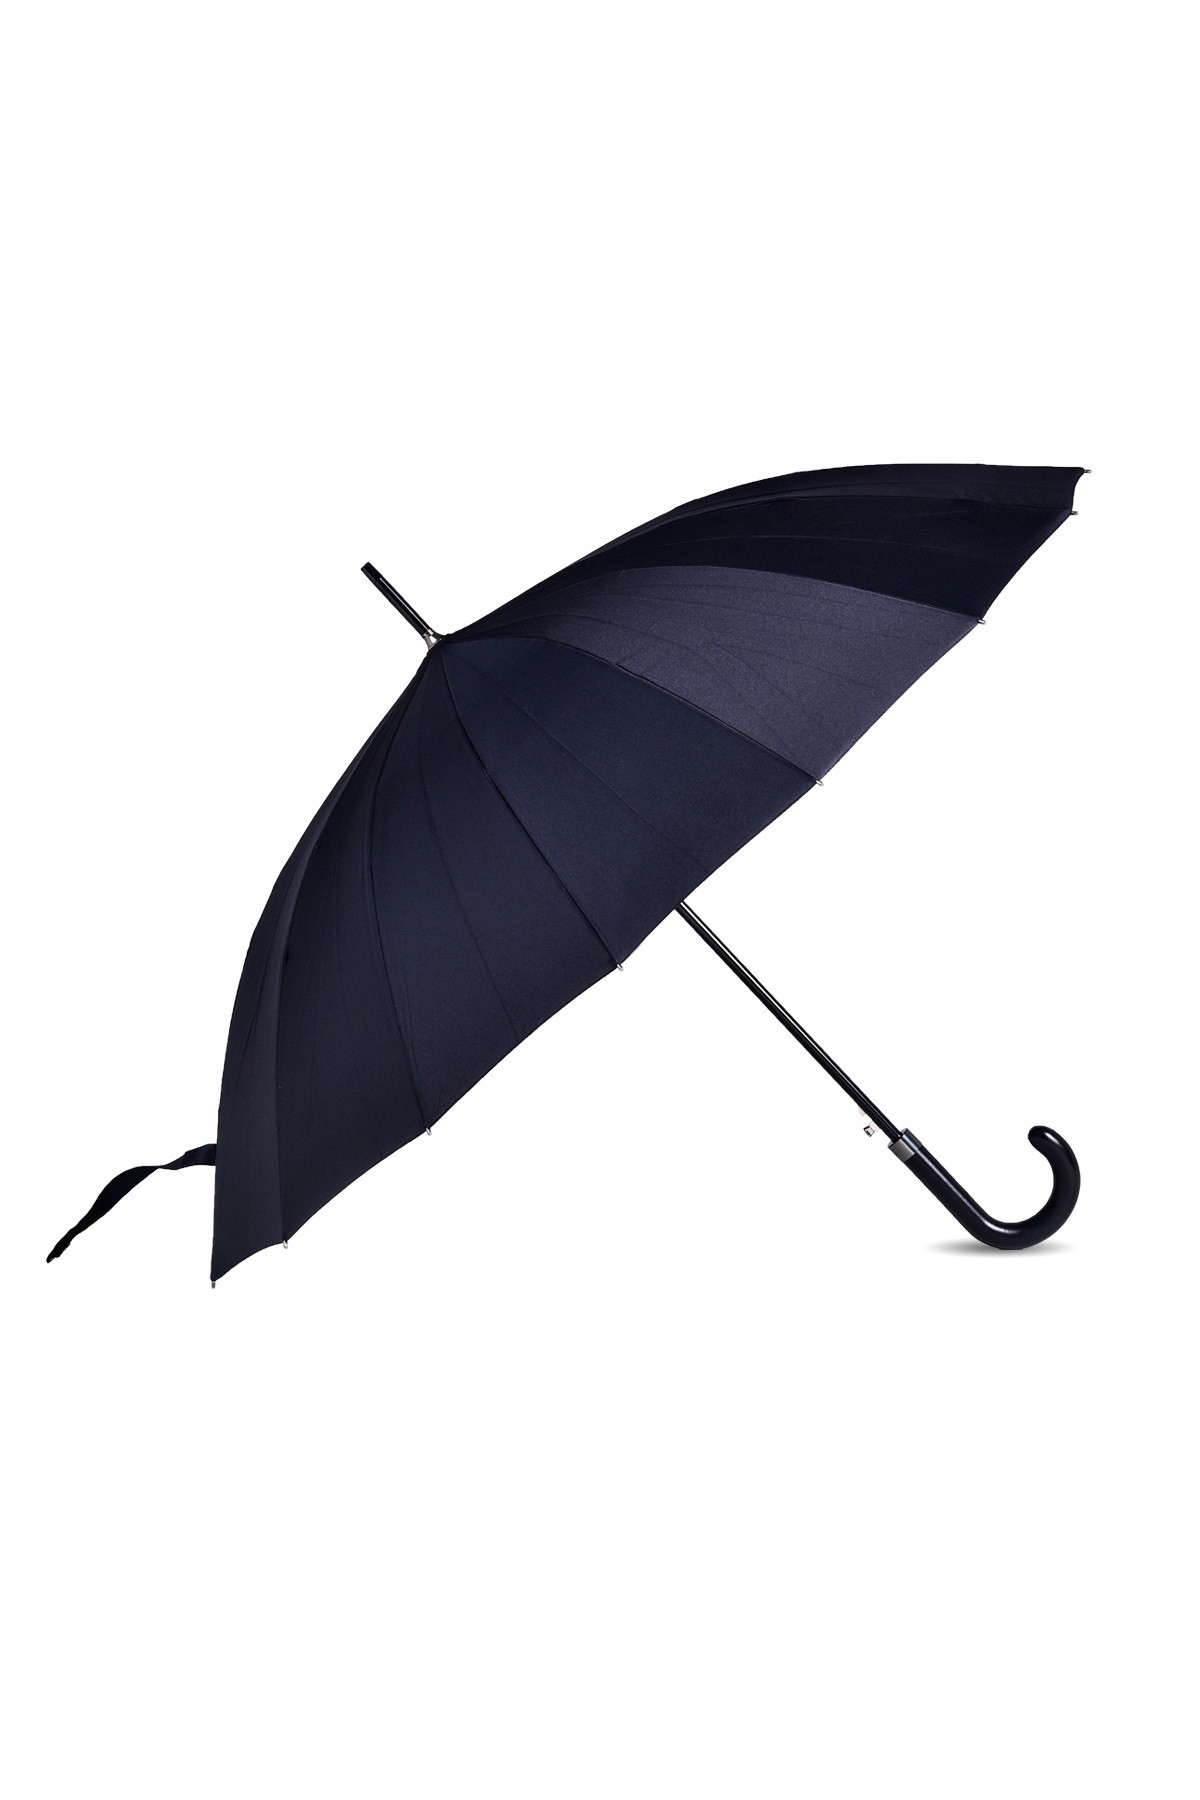 Czarny parasol męski.